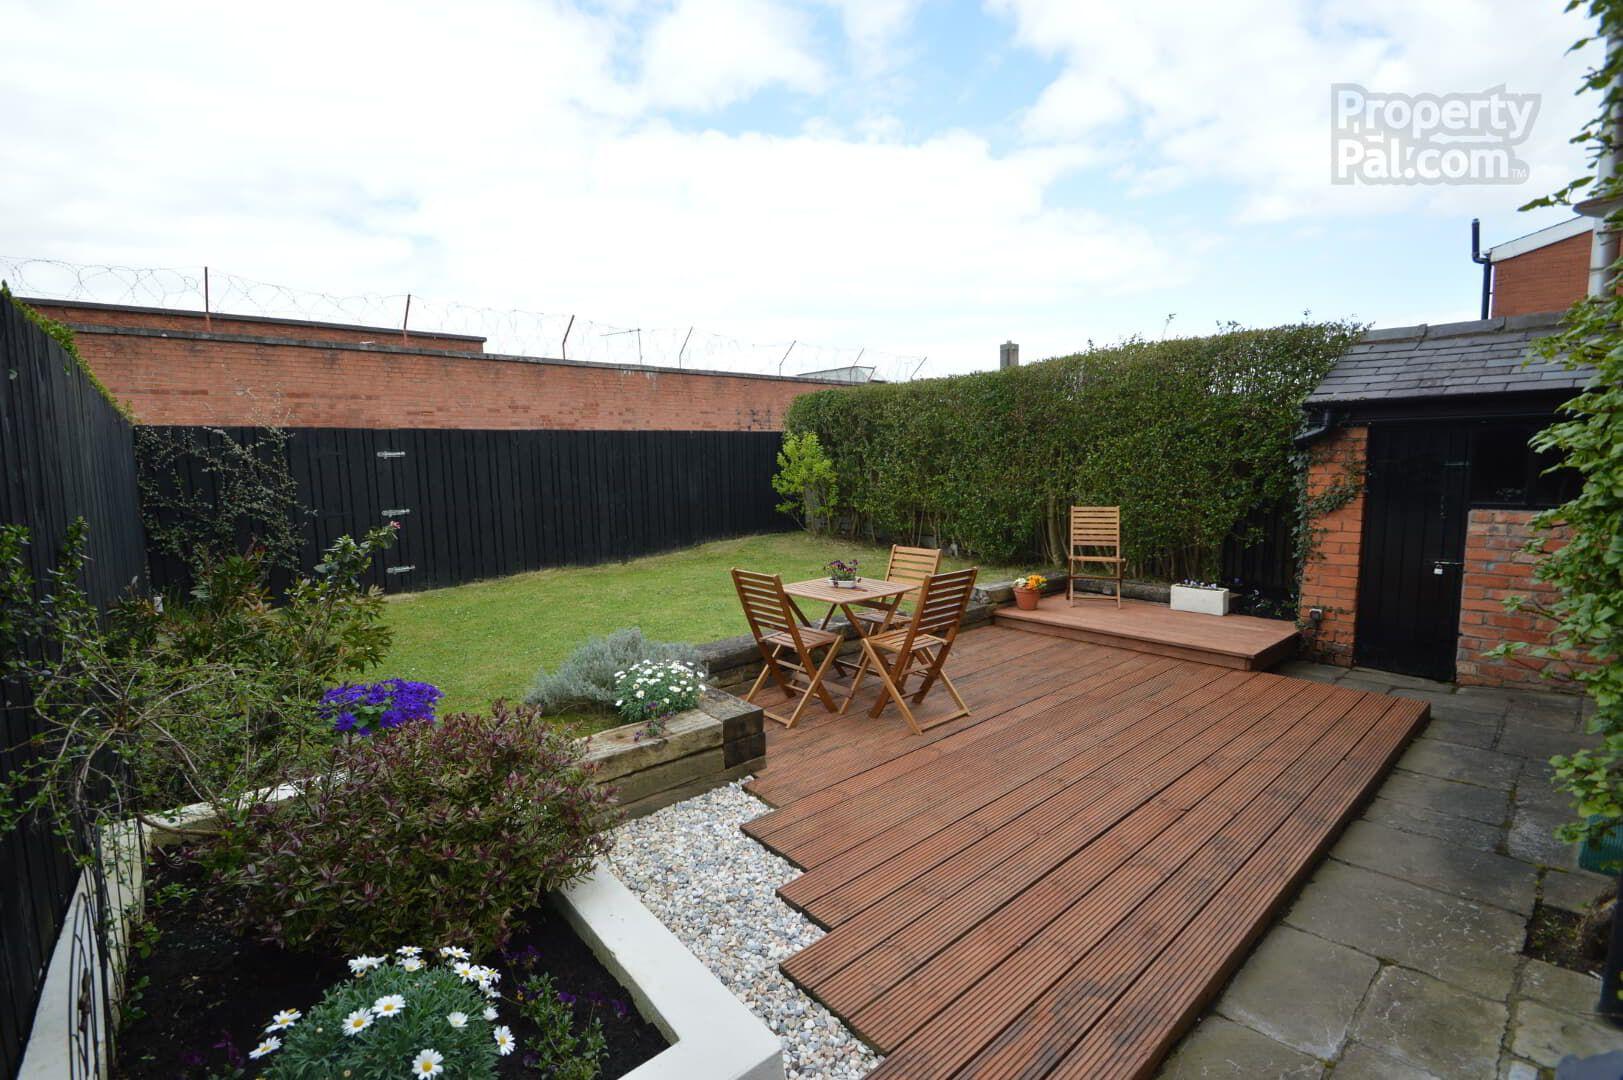 33 Kimberley Drive, Ormeau Road, Belfast | Small garden ...